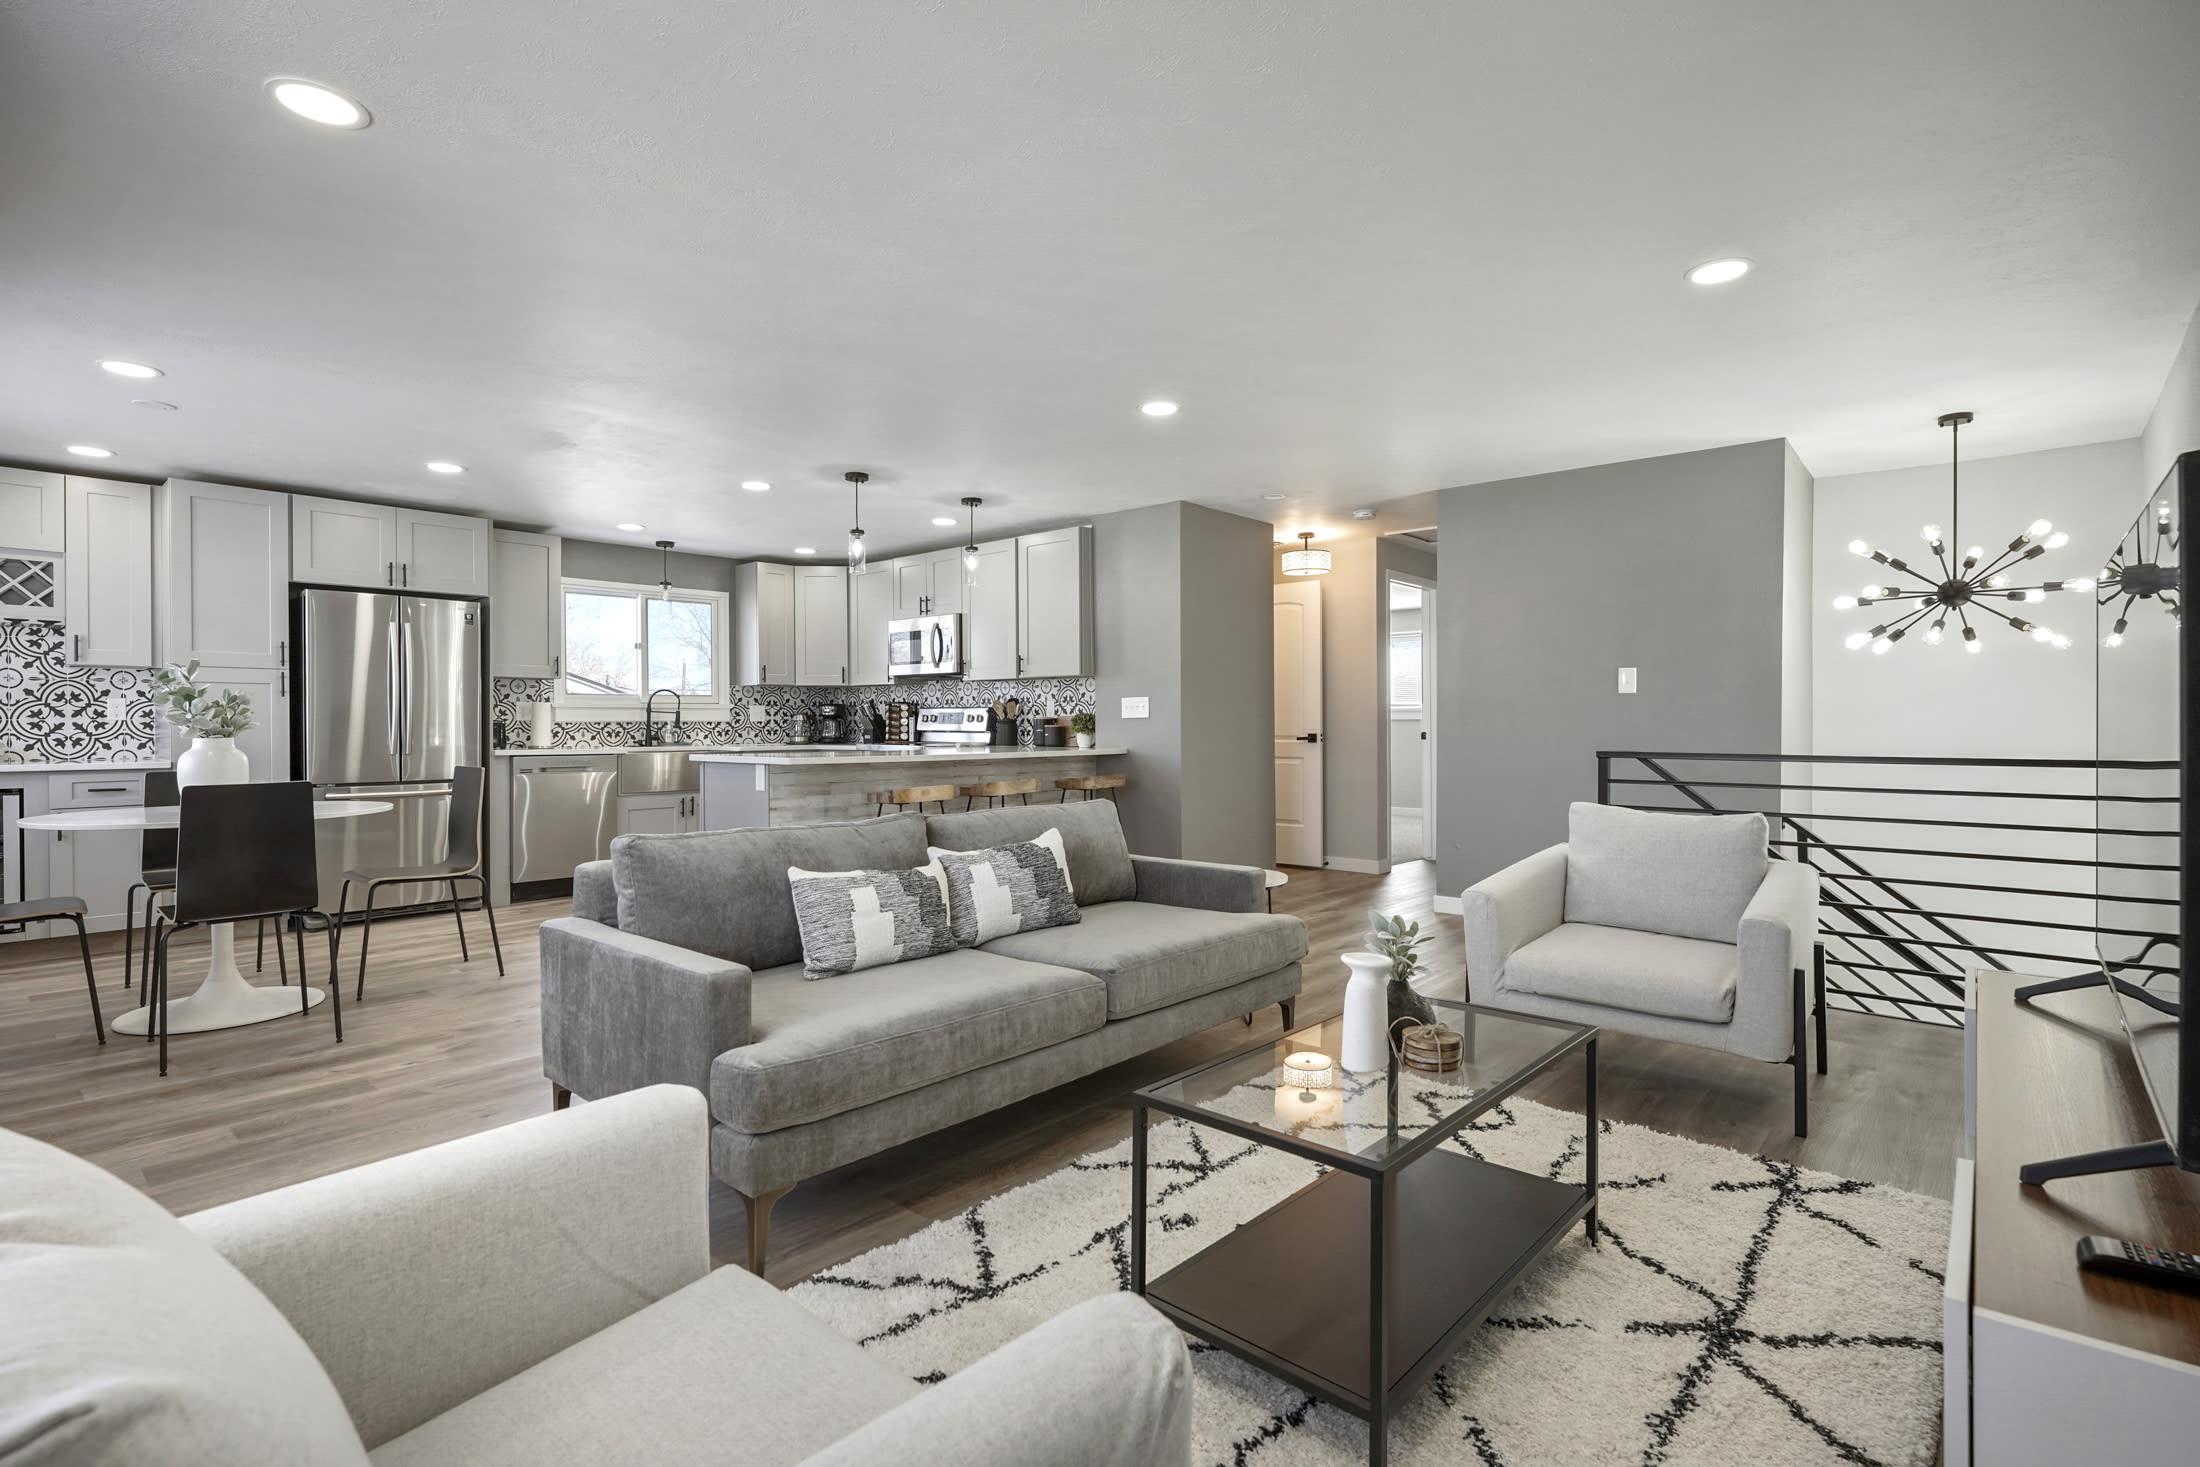 @ Marbella Lane - 4BR Executive House | Ldry + P